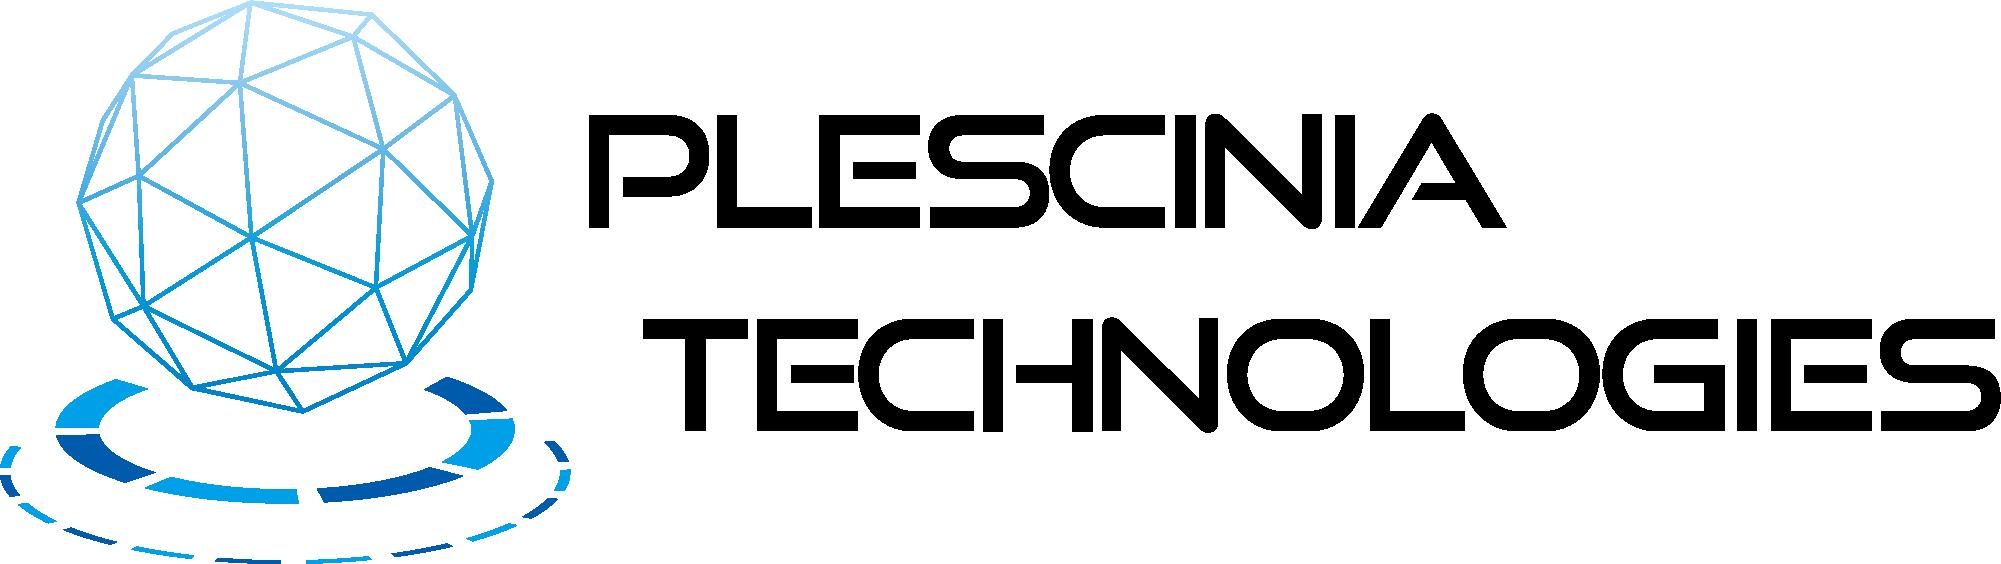 Plescinia Technologies